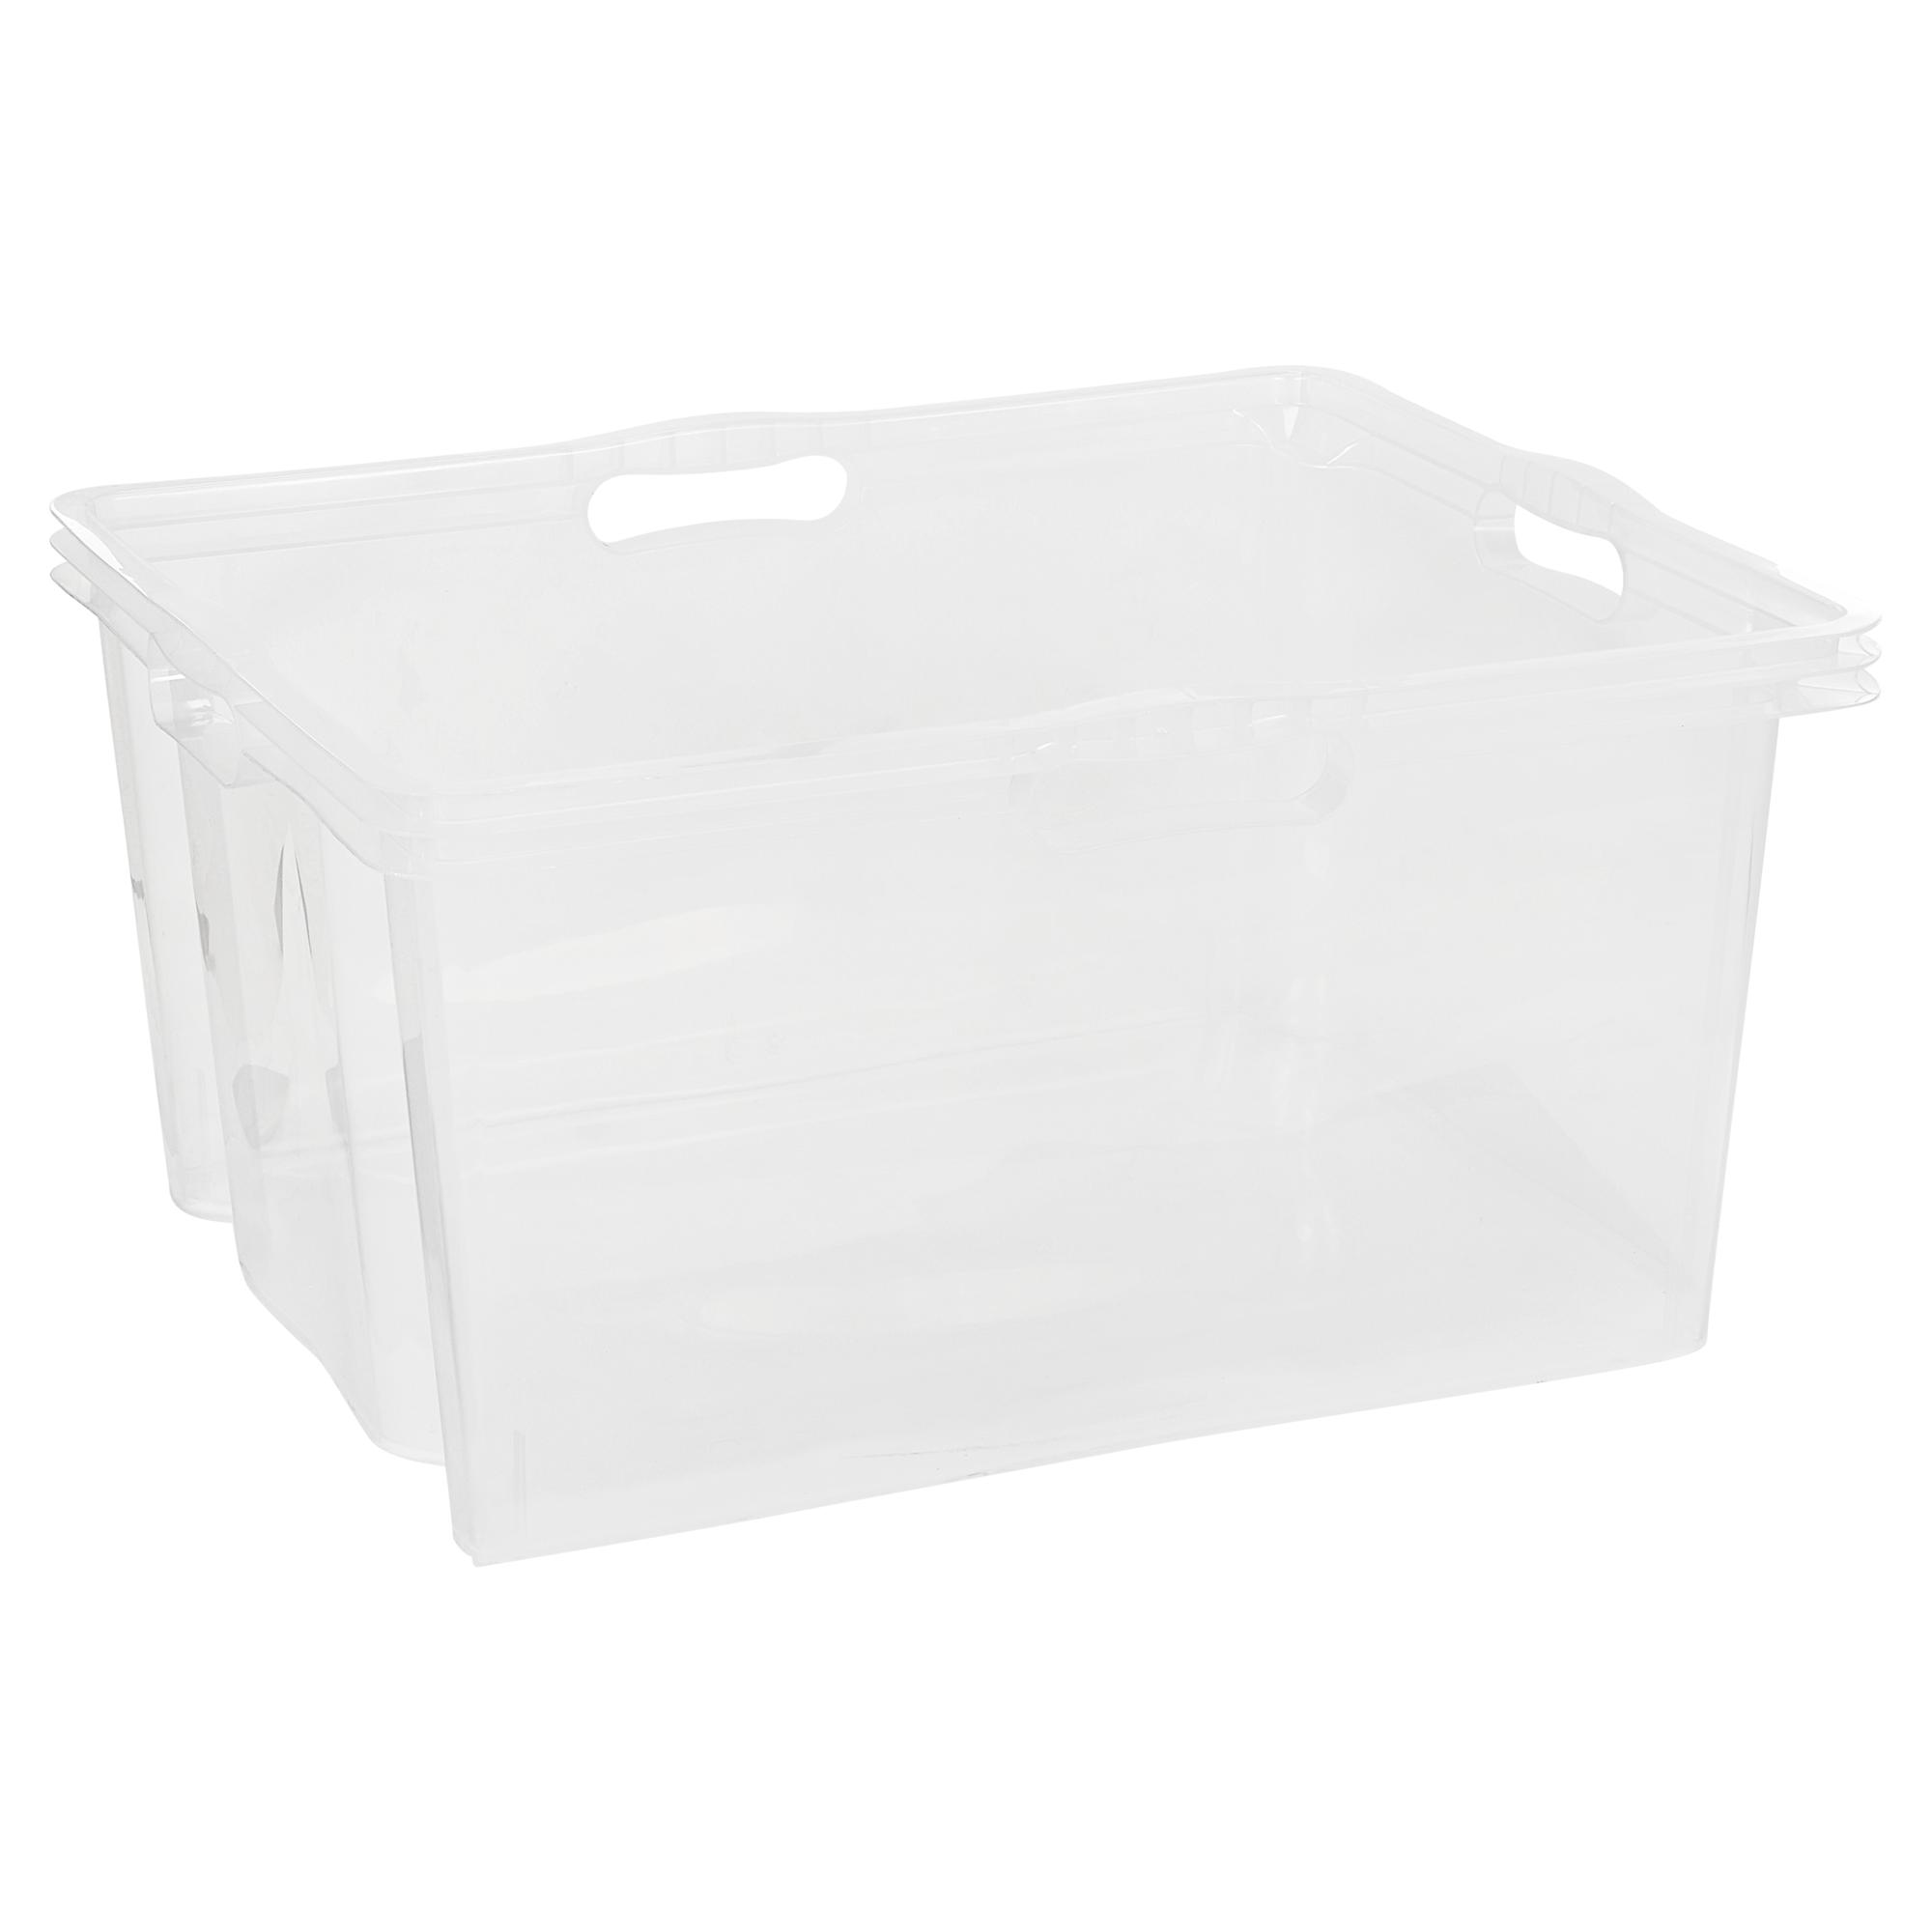 4 Stück 60x40x 22cm Lagerboxen Stapelboxen Kunststoffkisten UNISTA Kunststoffbox